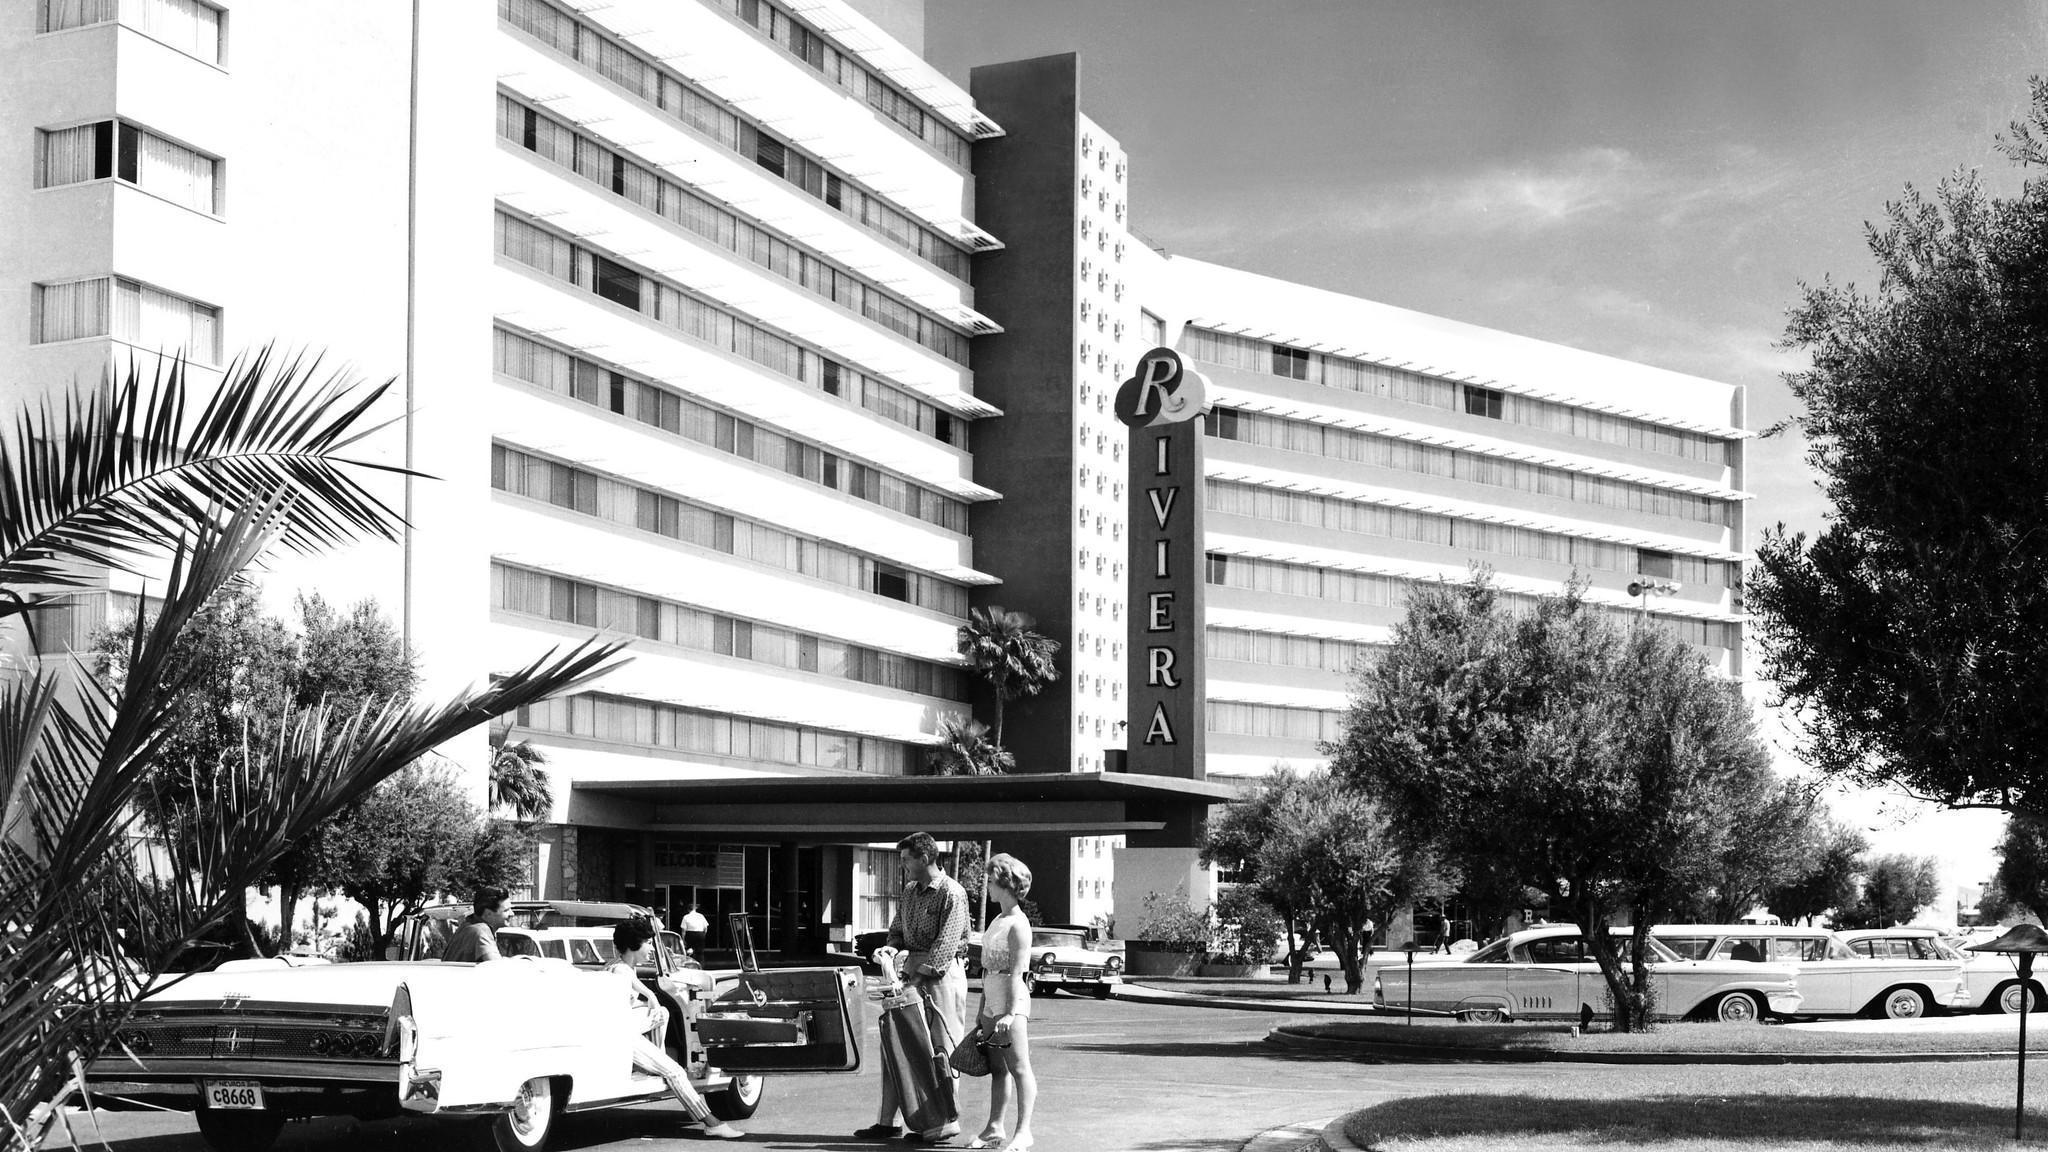 riveria hotel las vegas